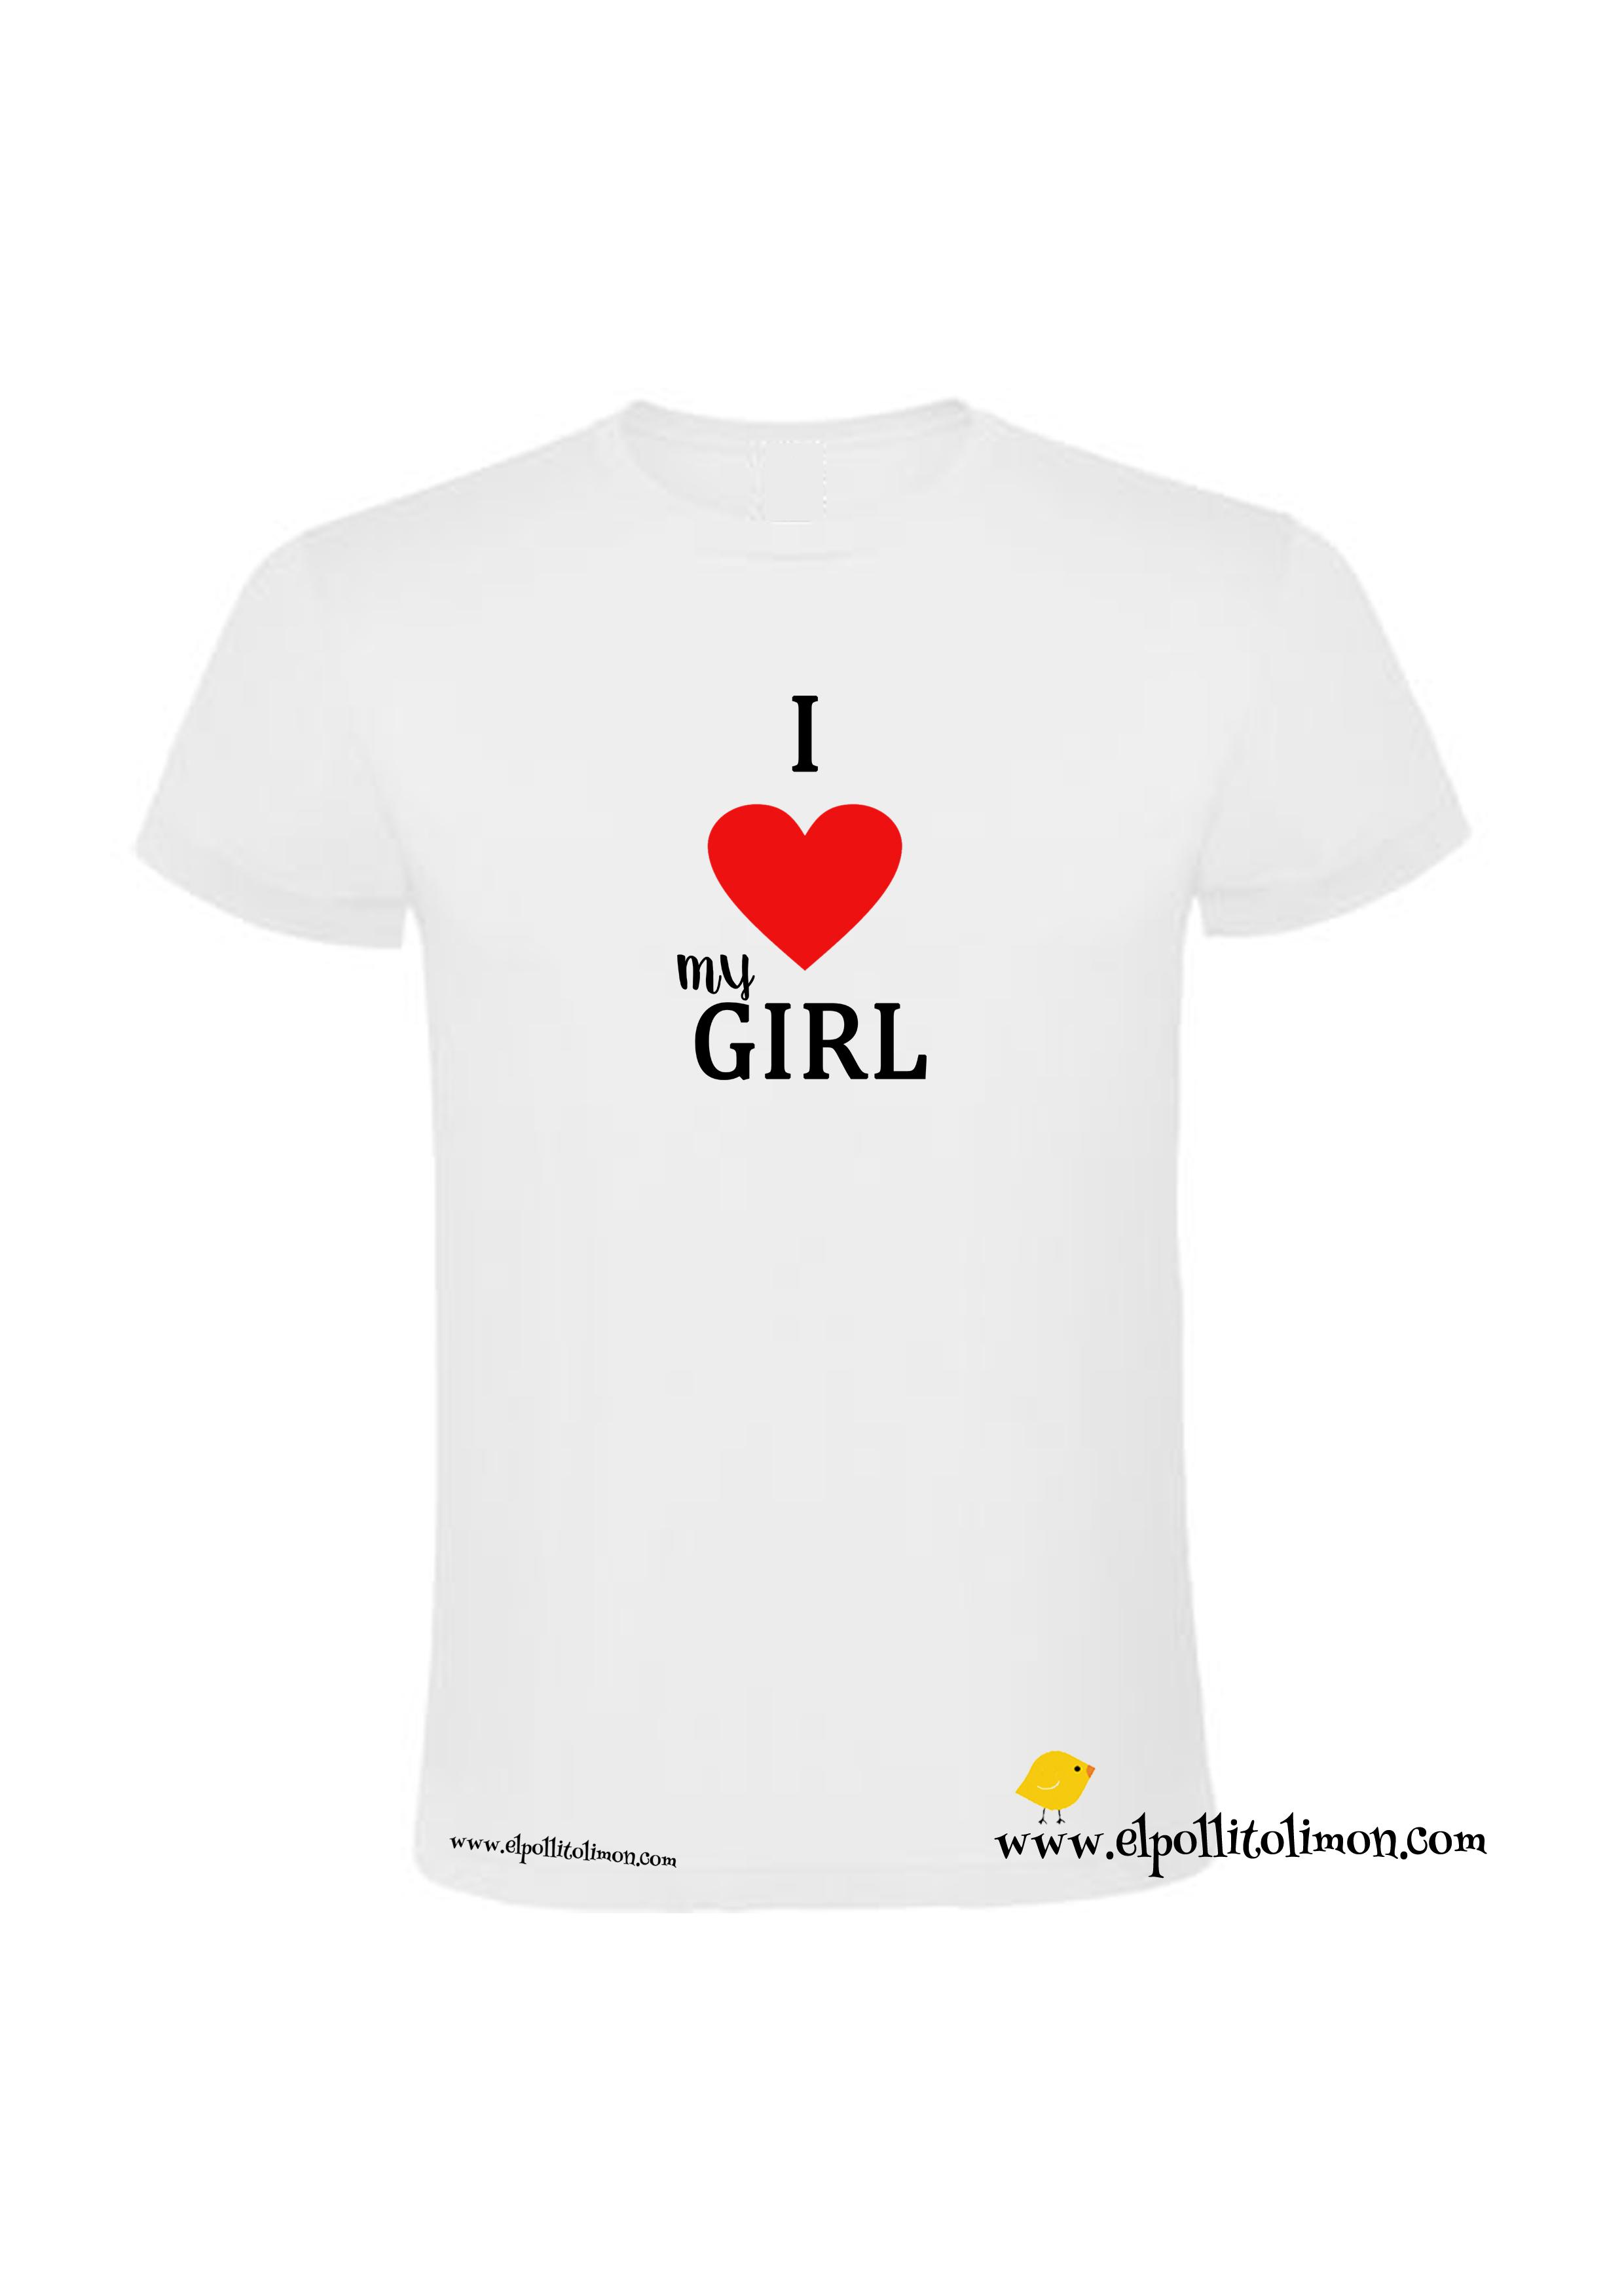 2 Valentín En Bote Chuches Camisetas Pack Regalo San 1 2 Tazas wR5X4q